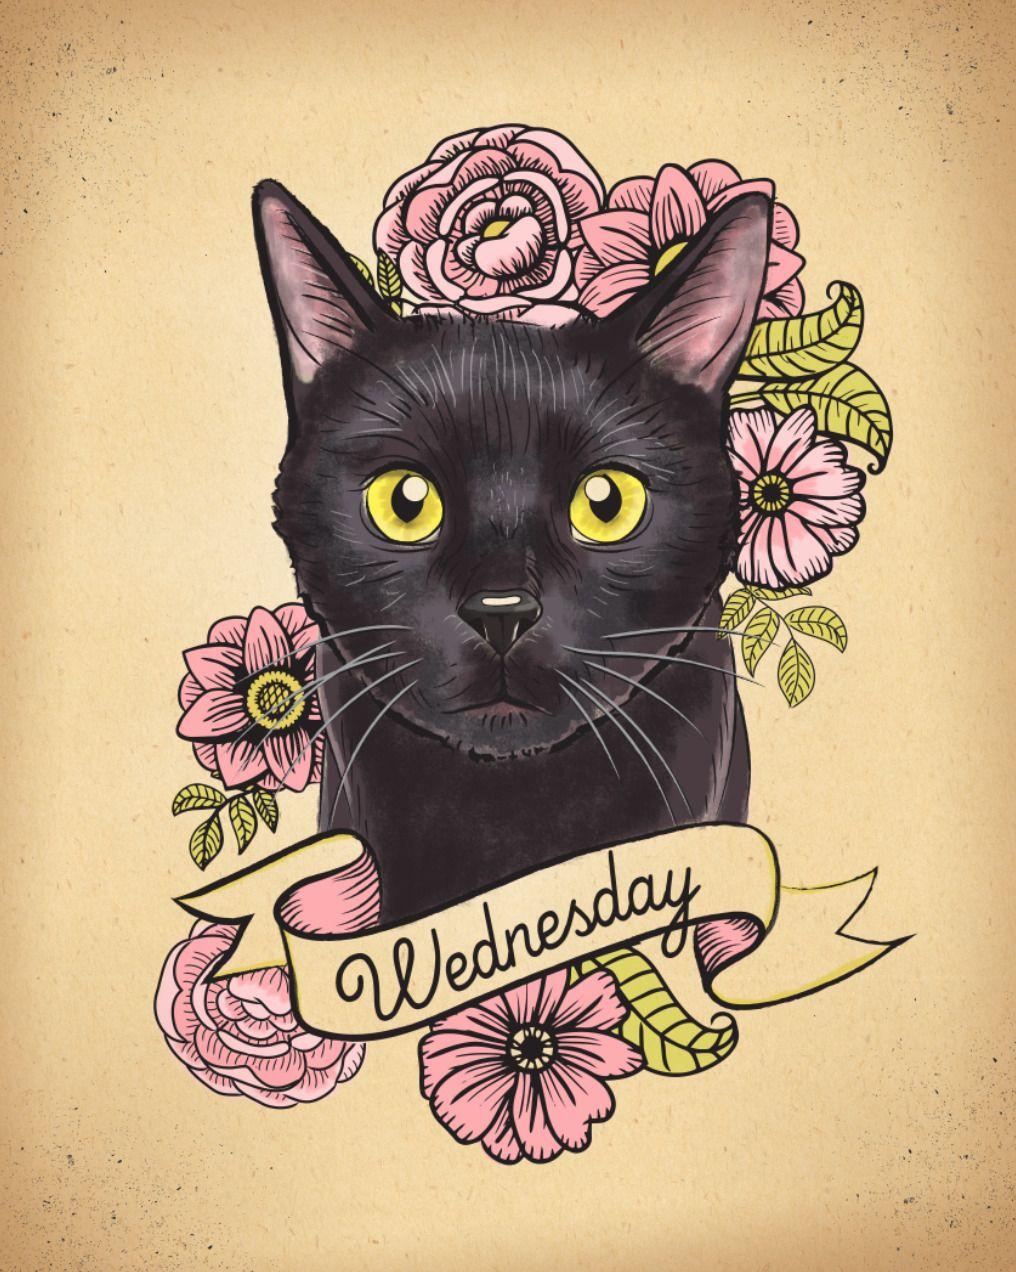 Custom Pet Portraits From Kudzumonster Etsy Com Cat Portrait Tattoos Black Cat Tattoos Cat Tattoo